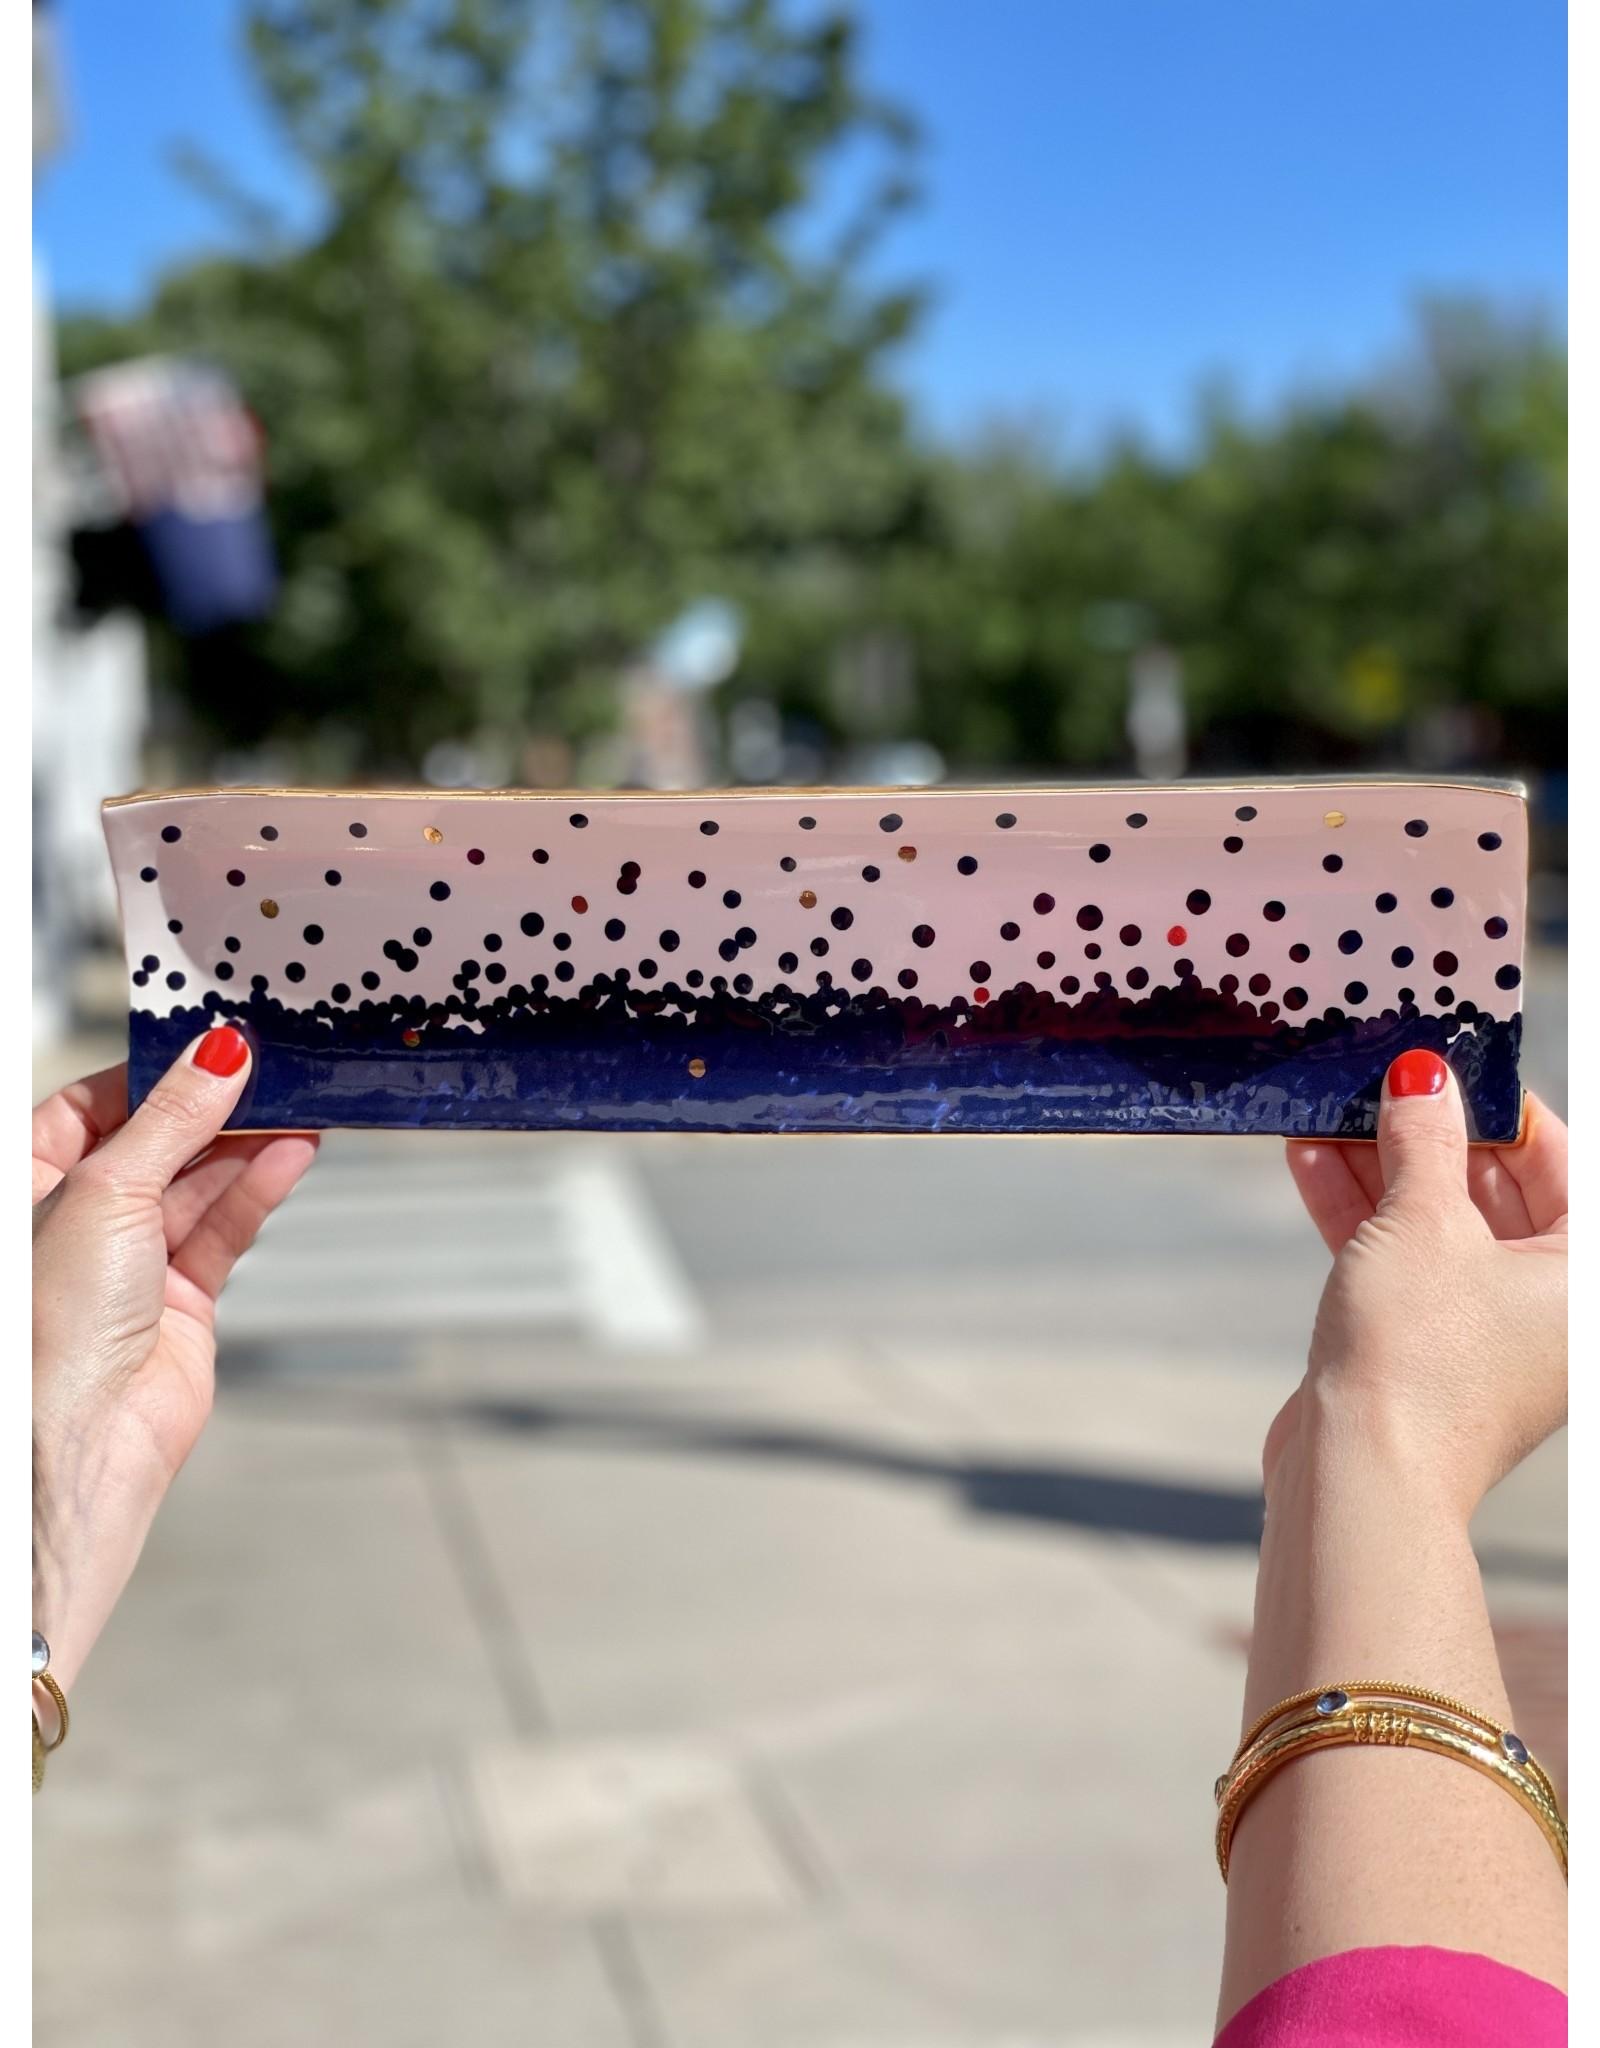 Jill Rosenwald Oyster Tray in Bubbly Blue + Gold Dot by Jill Rosenwald